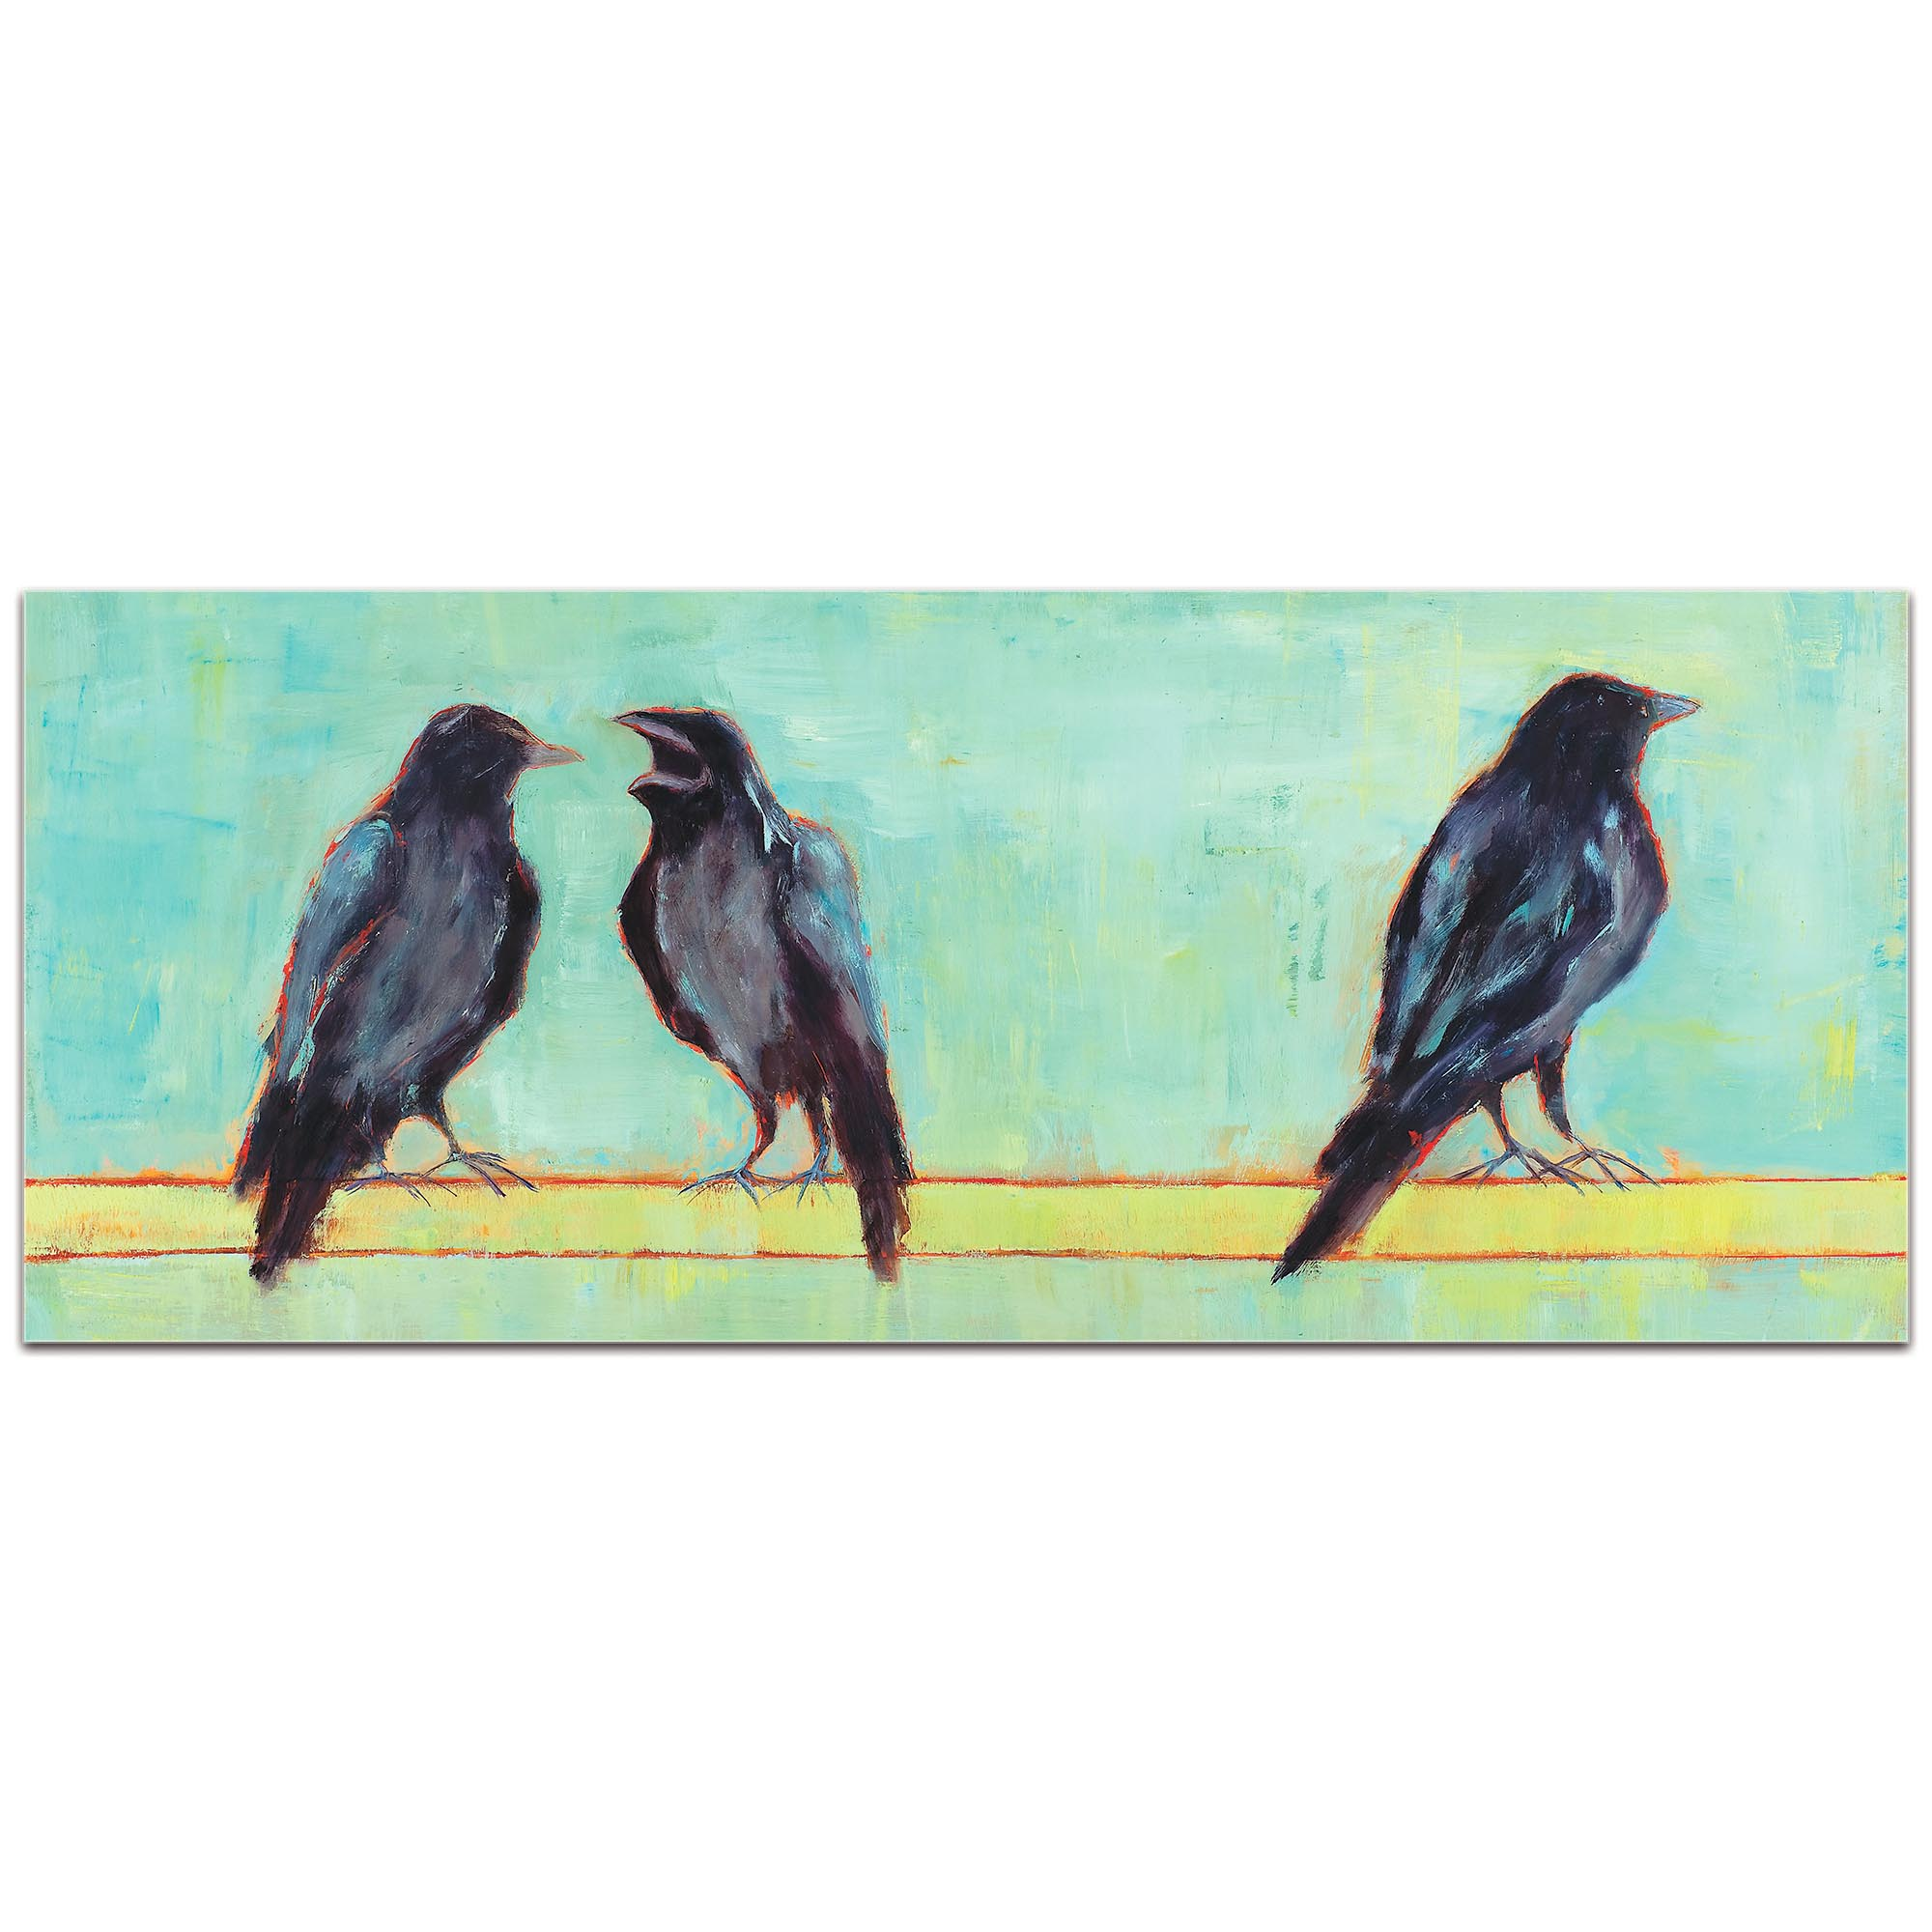 Contemporary Wall Art 'Crow Bar 2 v2' - Urban Birds Decor on Metal or Plexiglass - Image 2